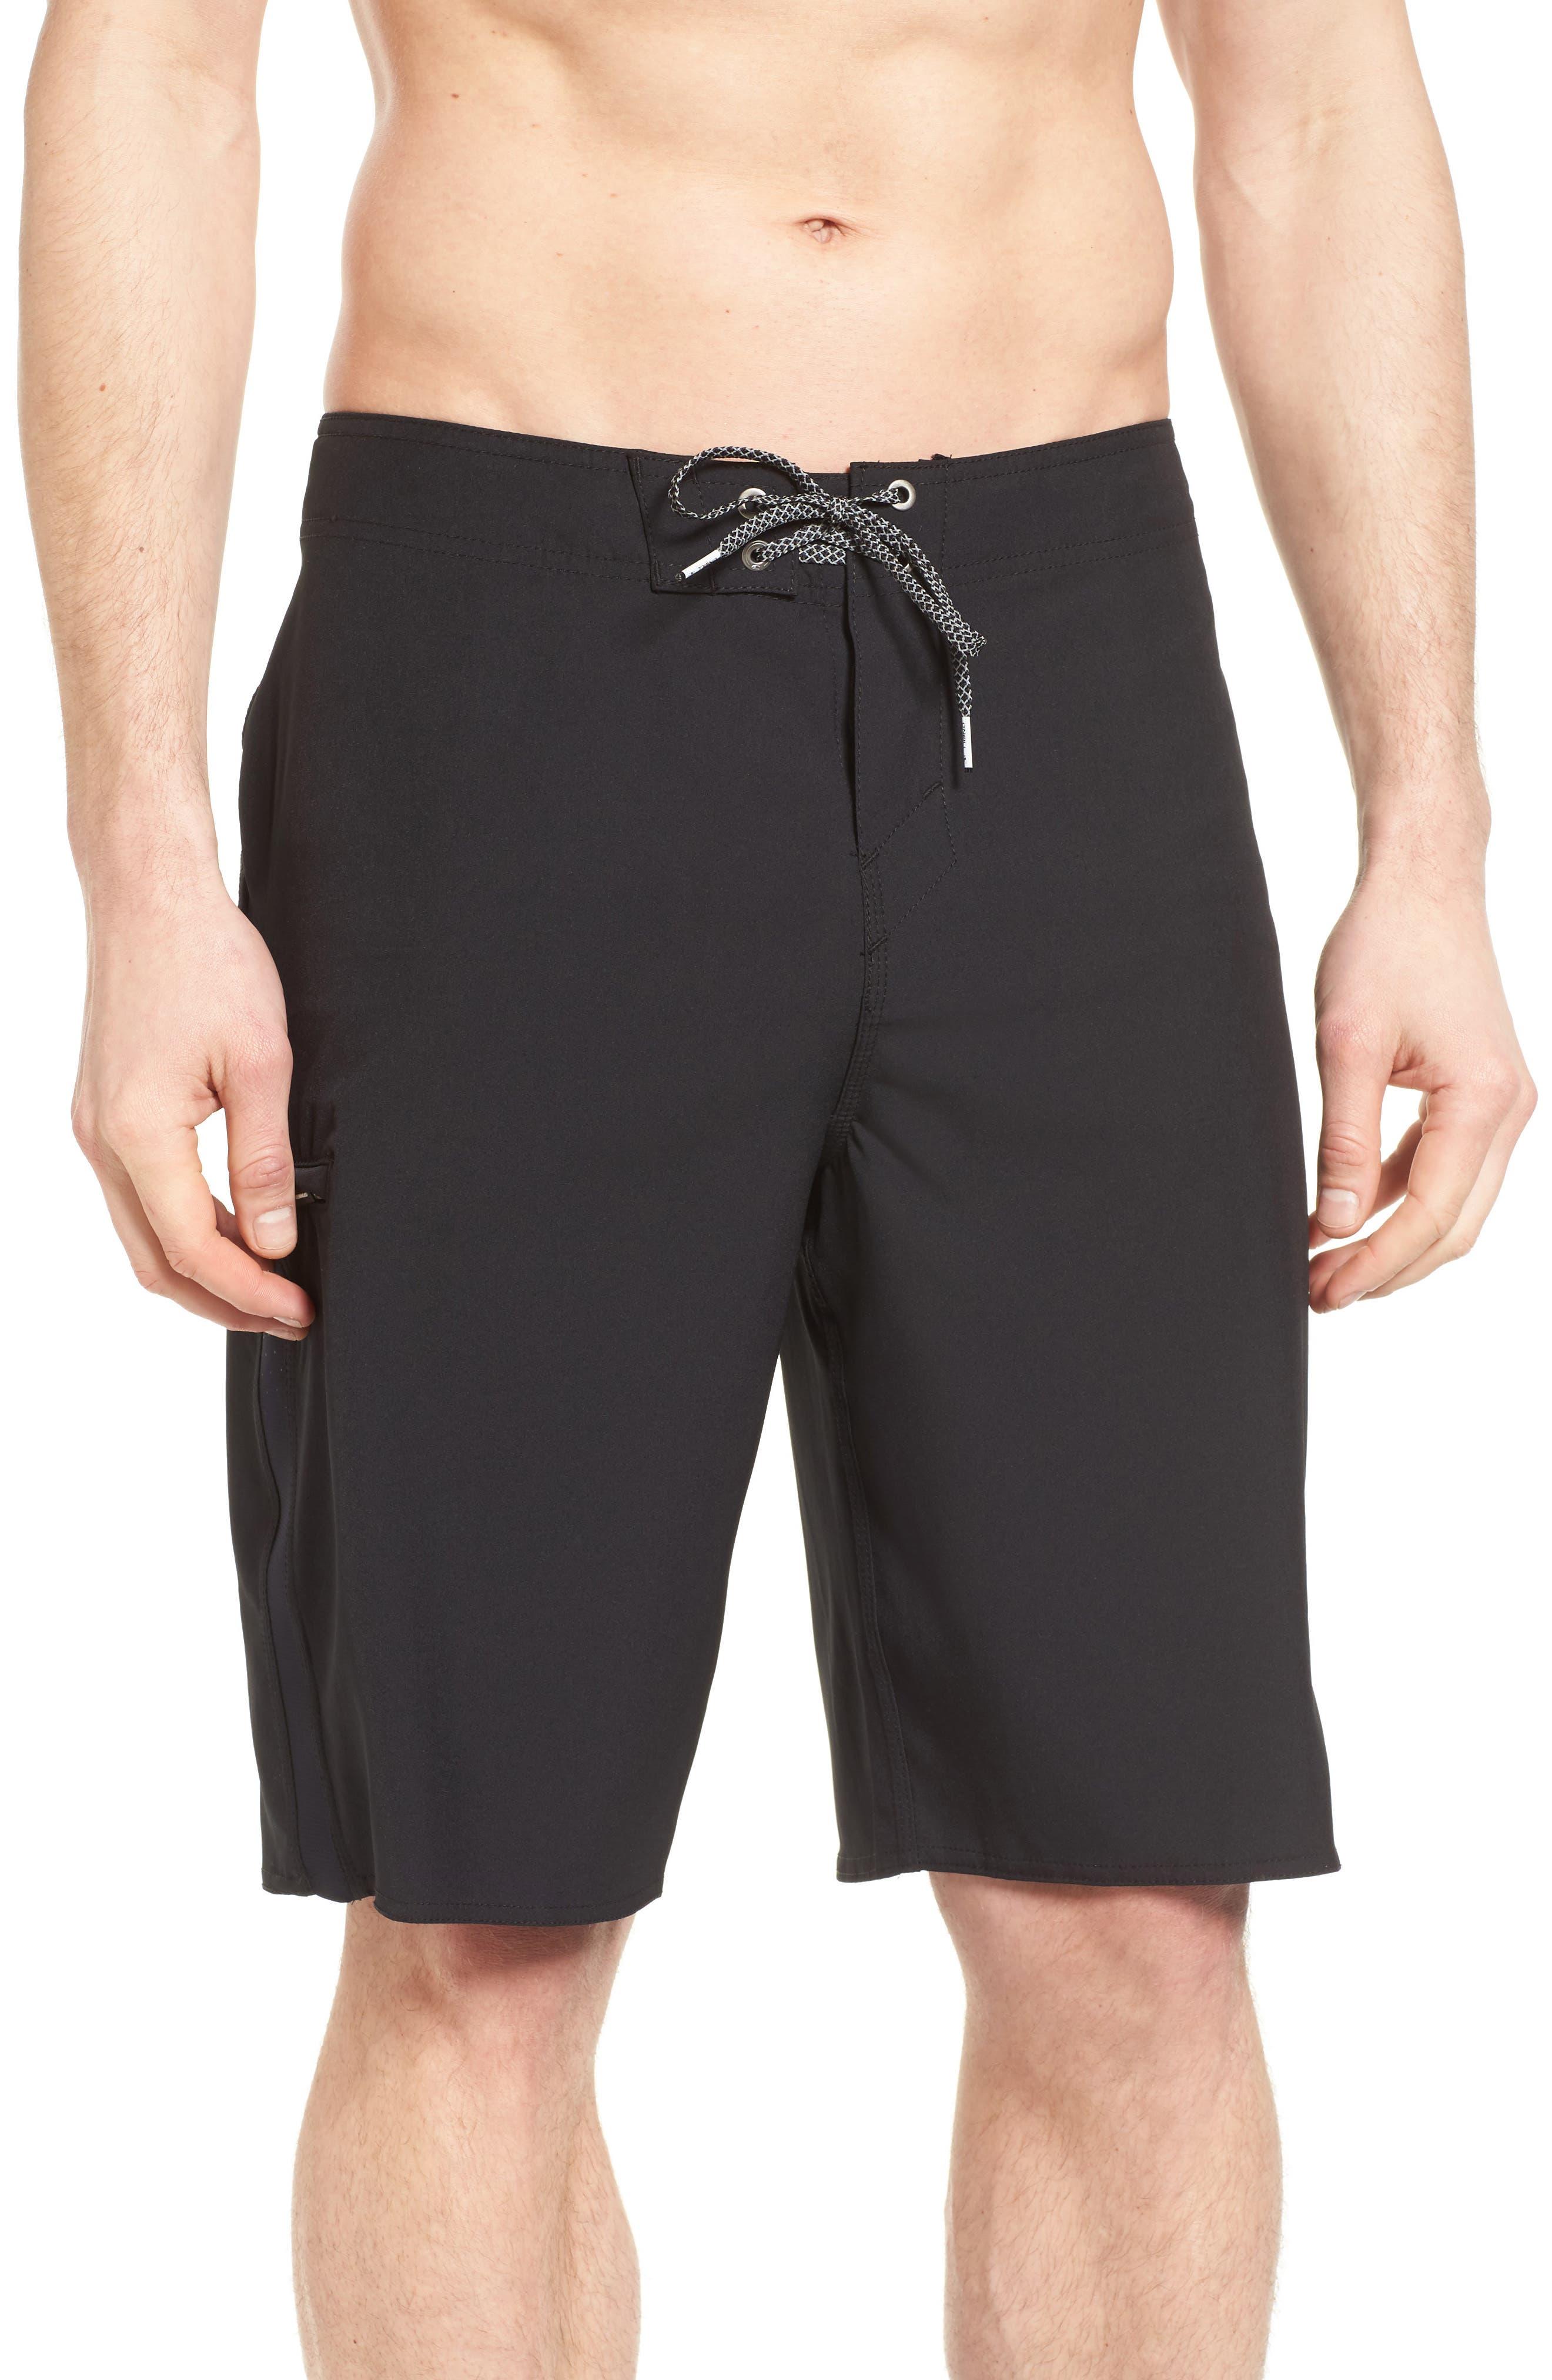 Superfreak Board Shorts,                         Main,                         color, Black